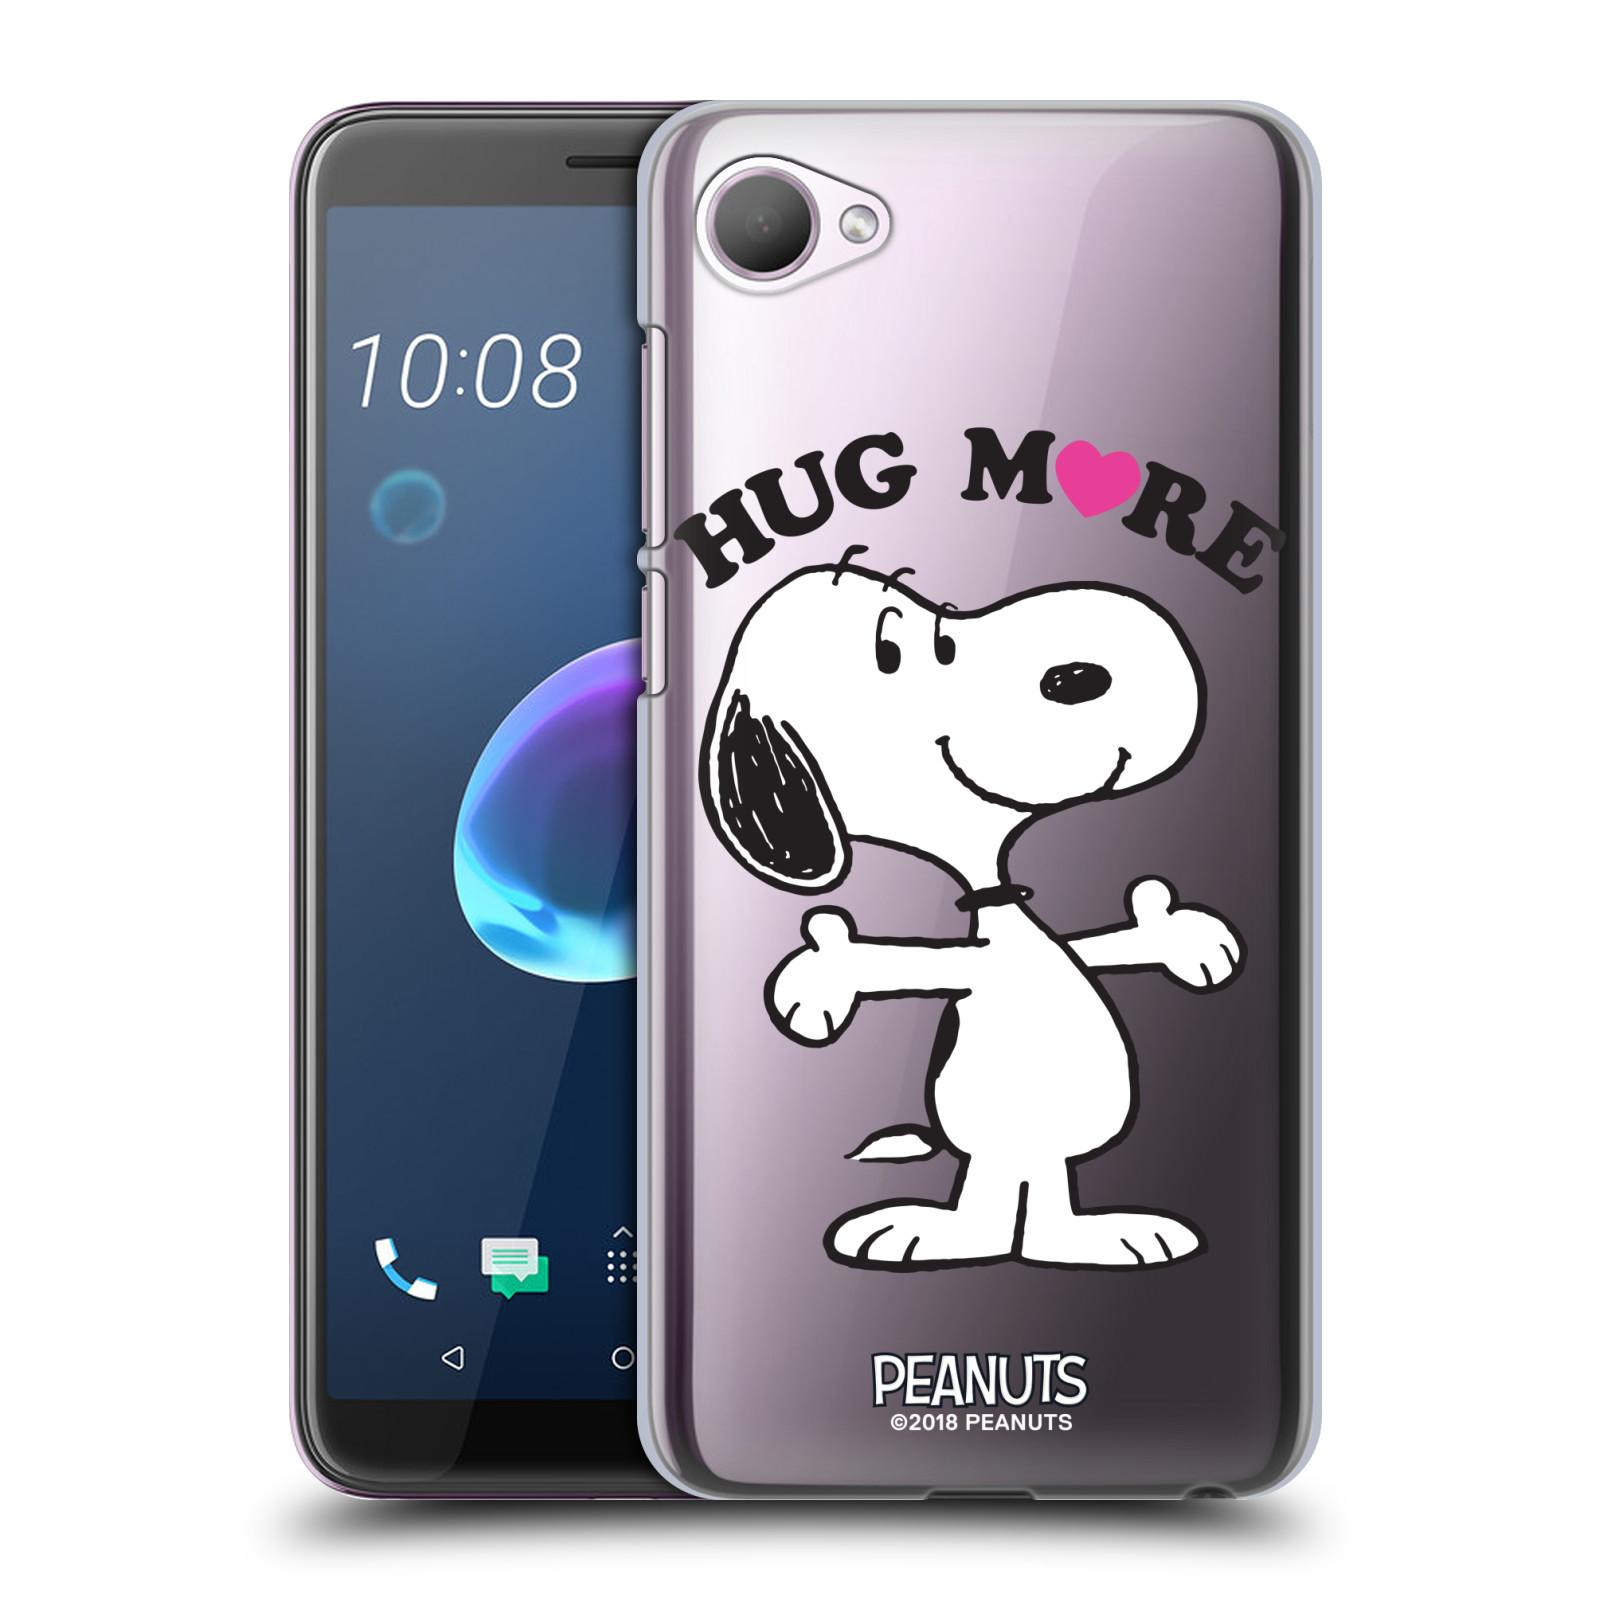 Pouzdro na mobil HTC Desire 12 / Desire 12 DUAL SIM Oficiální motiv Peanuts pejsek Snoopy srdíčko